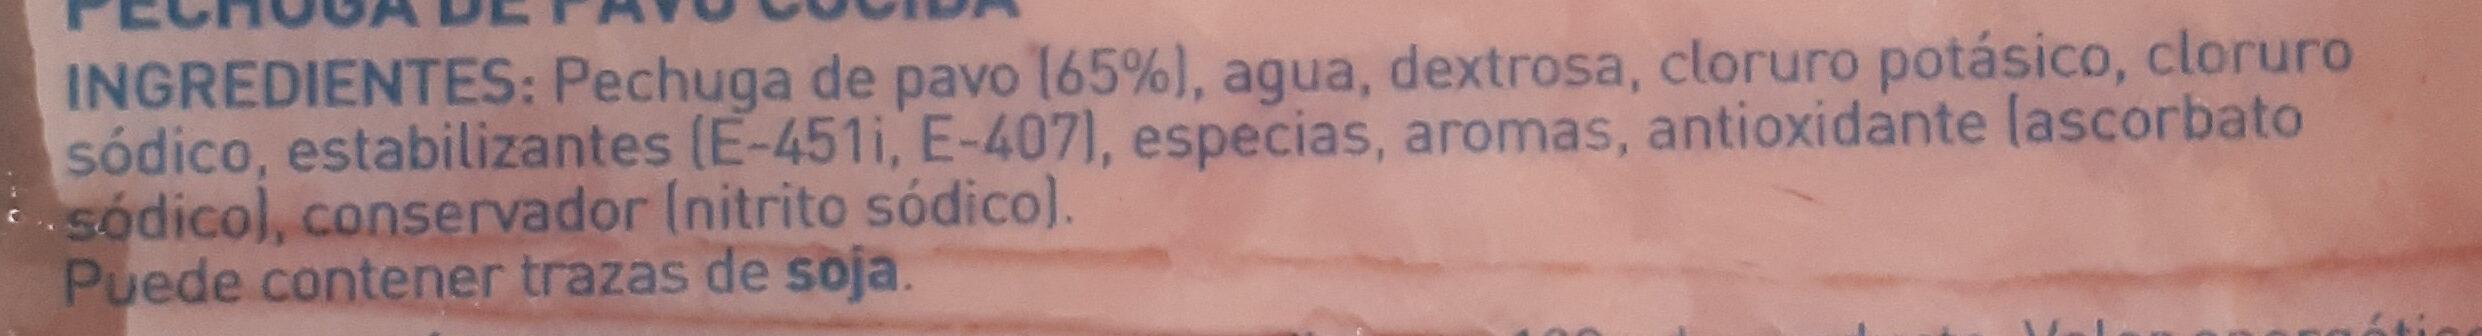 Pechuga pavo finas lonchas reducido de sal - Ingredients - es